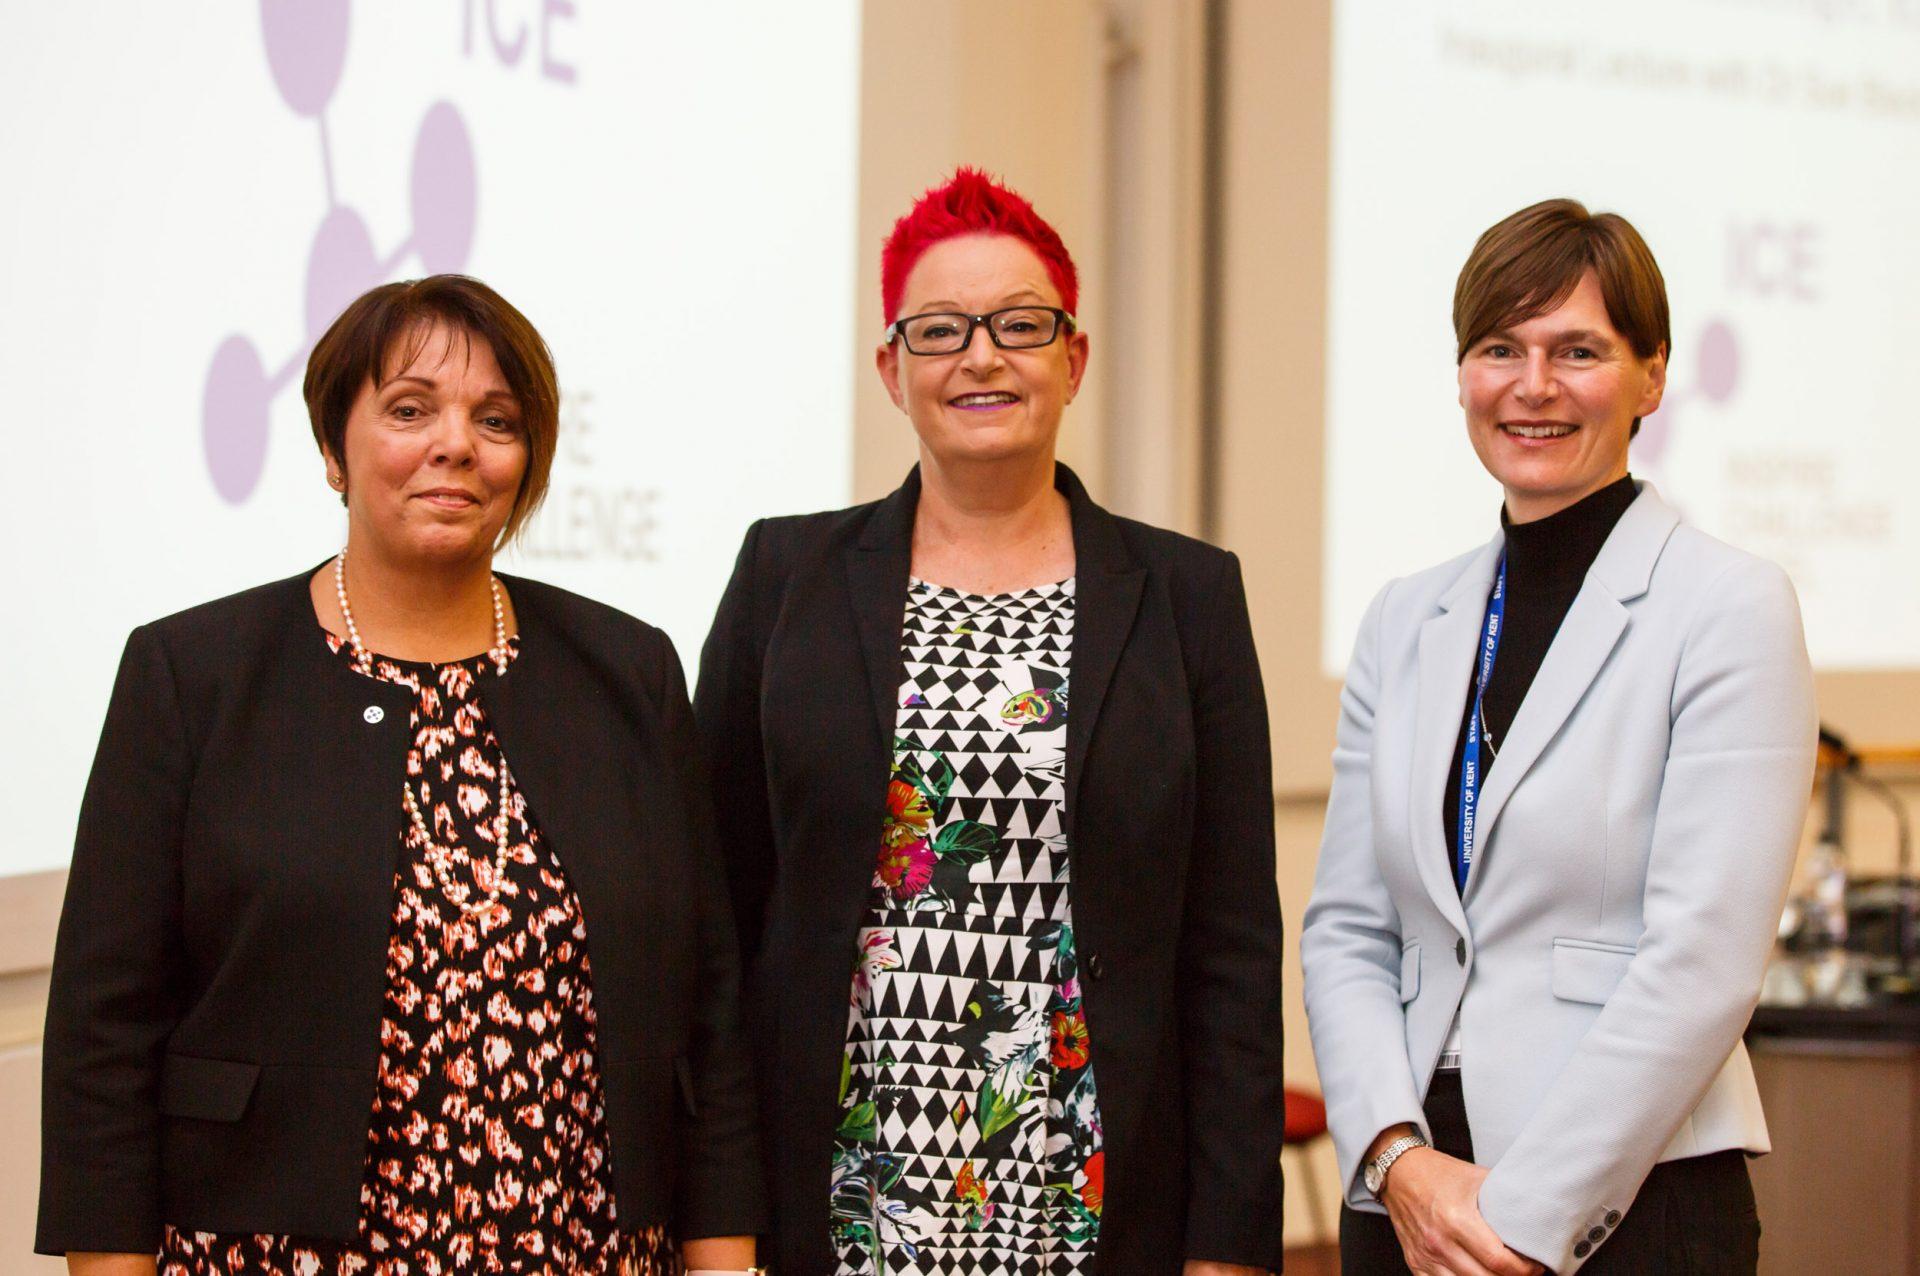 Portrait of Dr Sue Black with Vice-Chancellor Professor Karen Cox and Carole Barron.